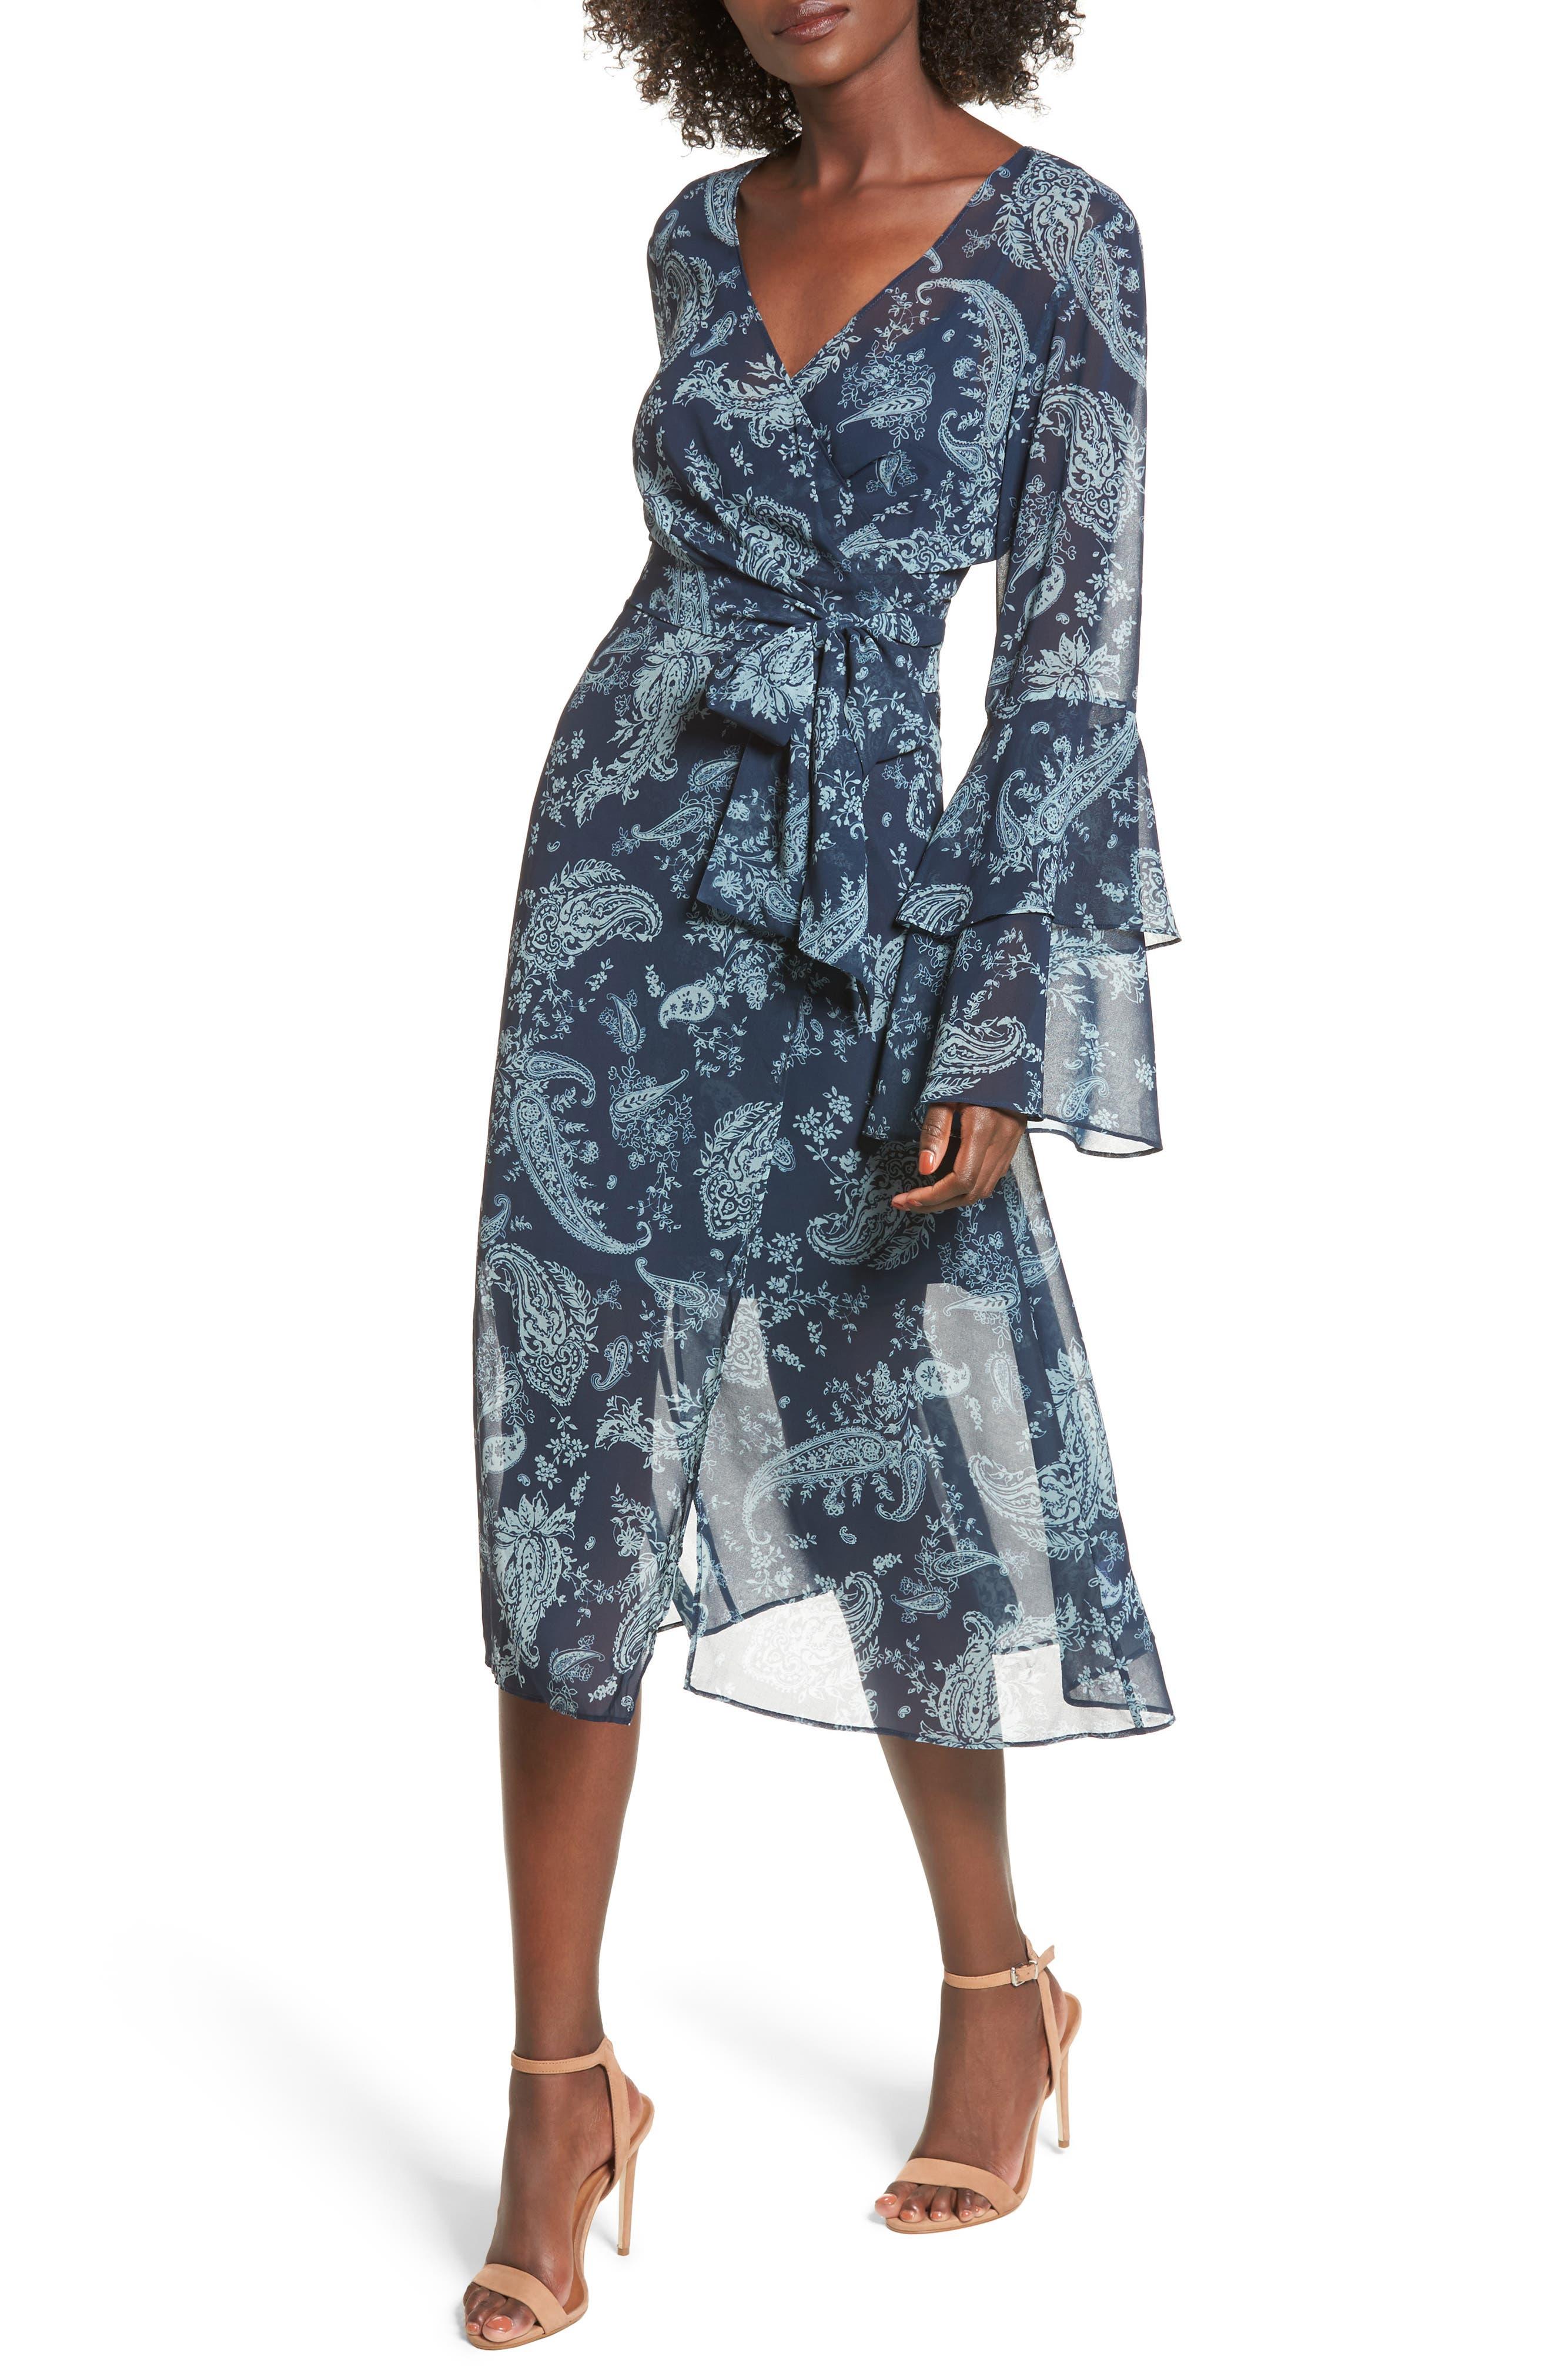 Go With It Wrap Midi Dress,                         Main,                         color, Navy Paisley